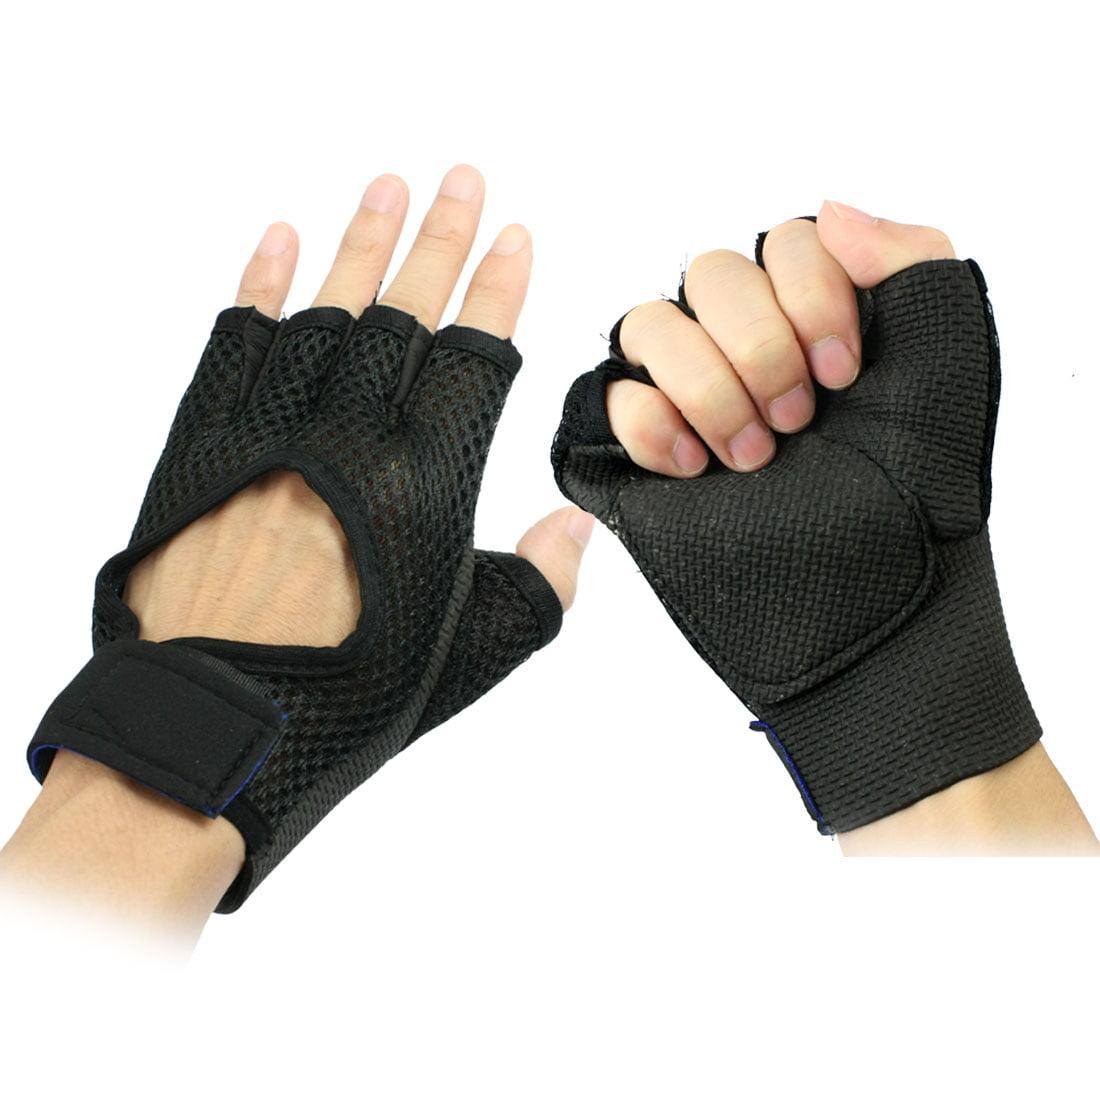 Adult Stretchy Neoprene Rubber Half Finger Sports Glove Paml Protector